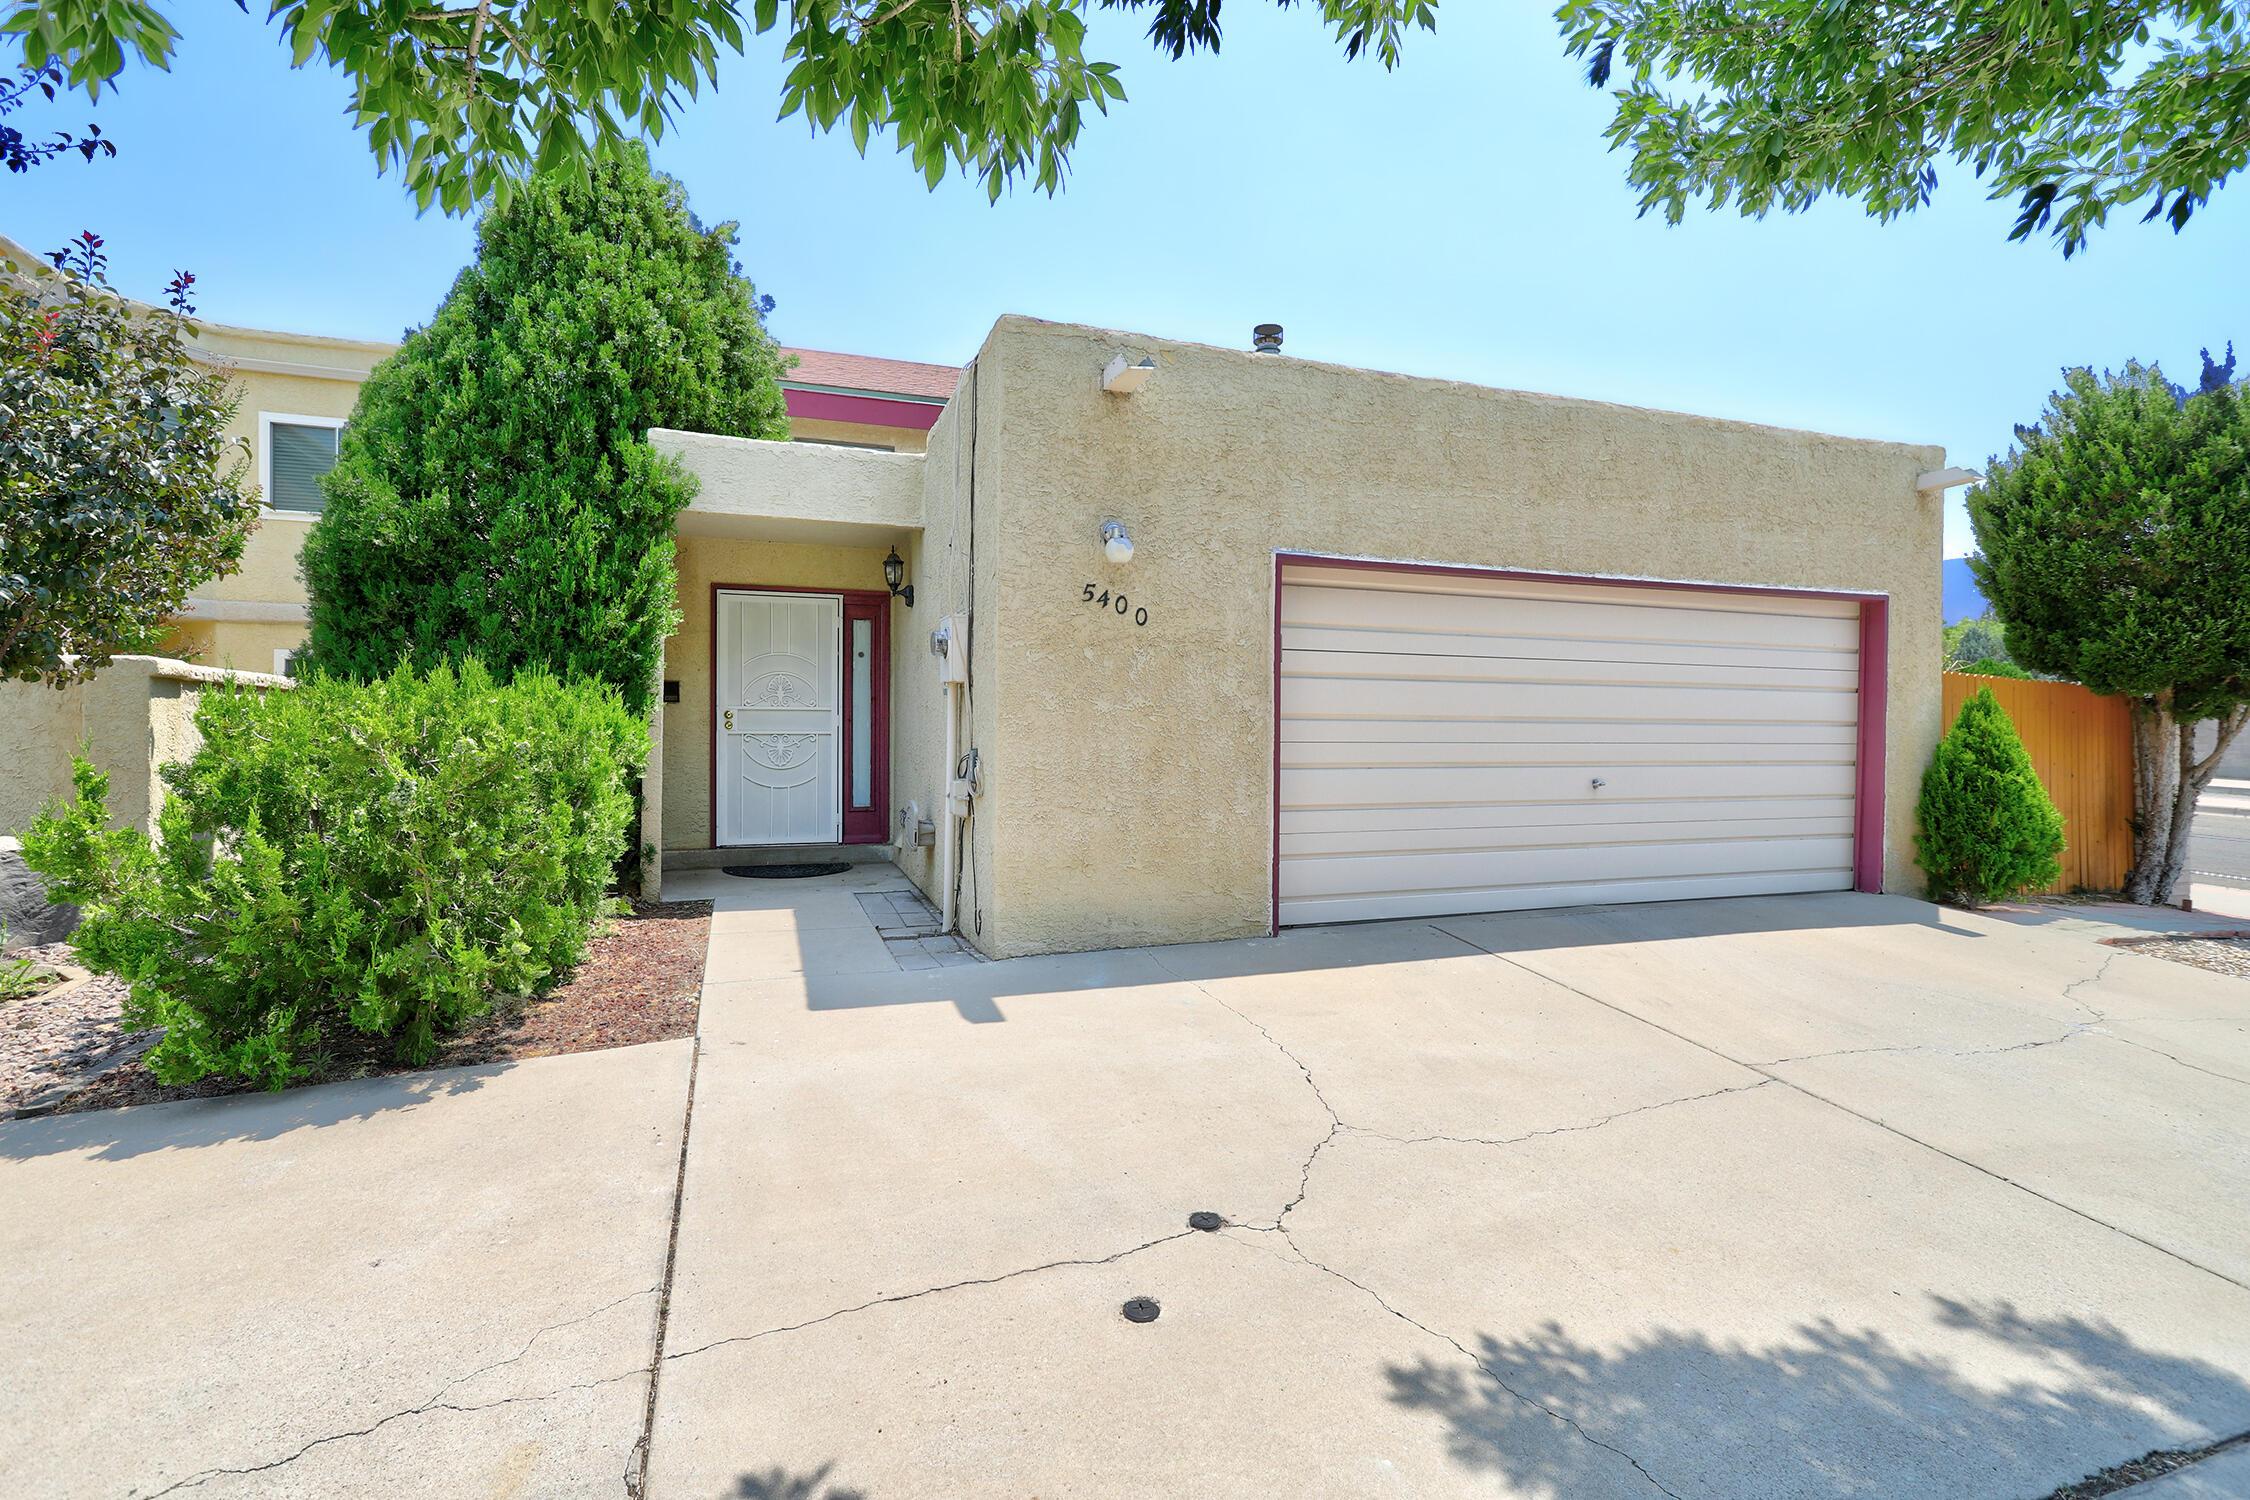 5400 OverLook Drive, Albuquerque NM 87111